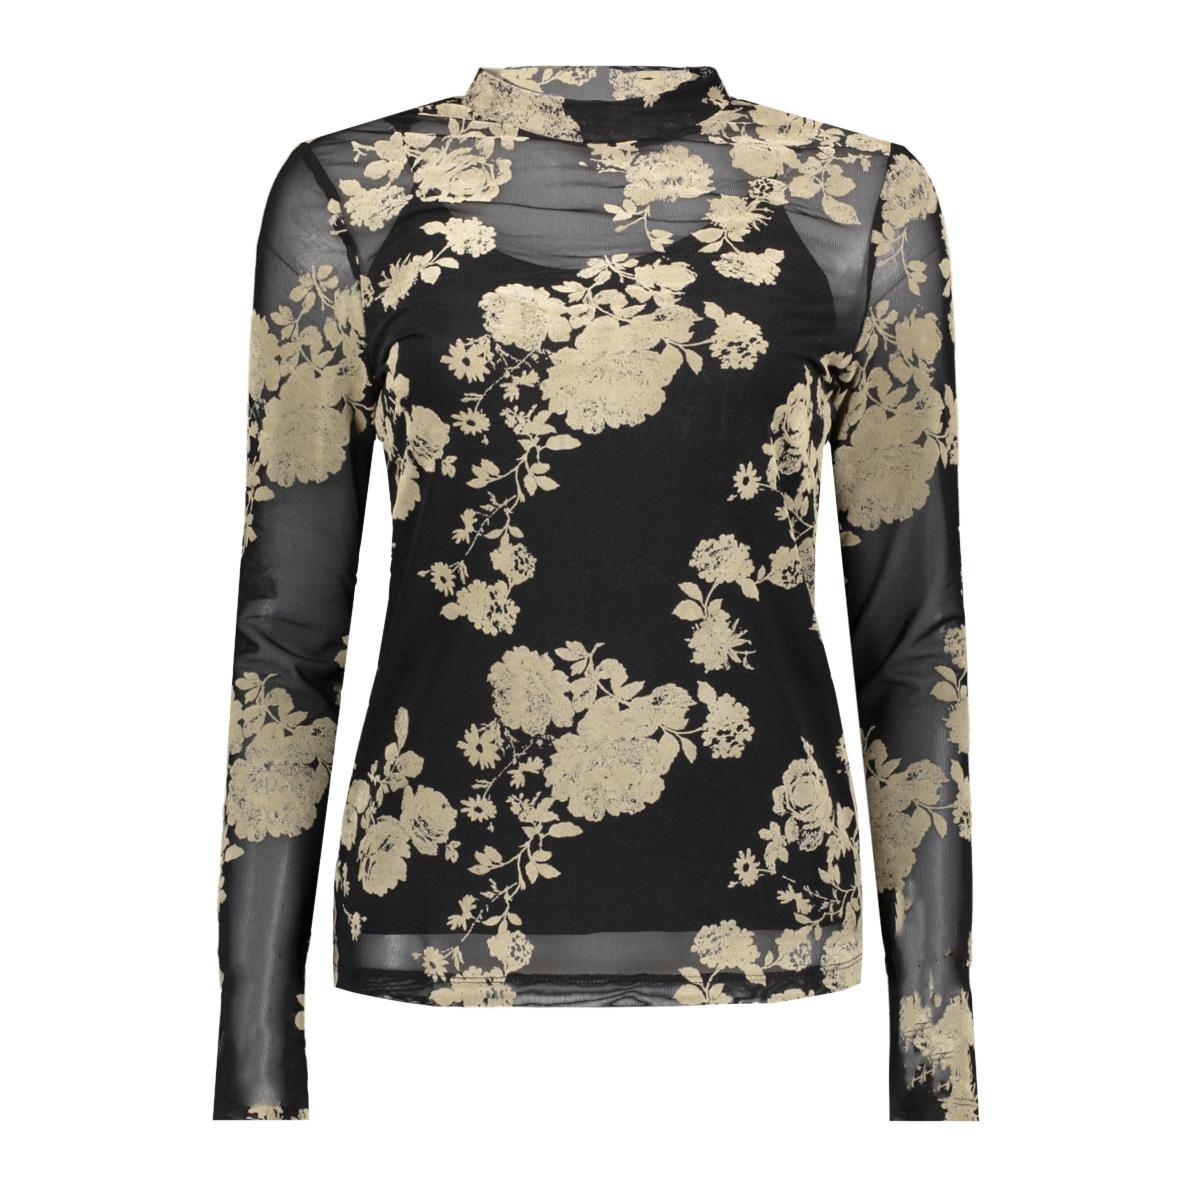 vmflirty l/s midi highneck top d2-8 10207132 vero moda t-shirt black/oatmeal